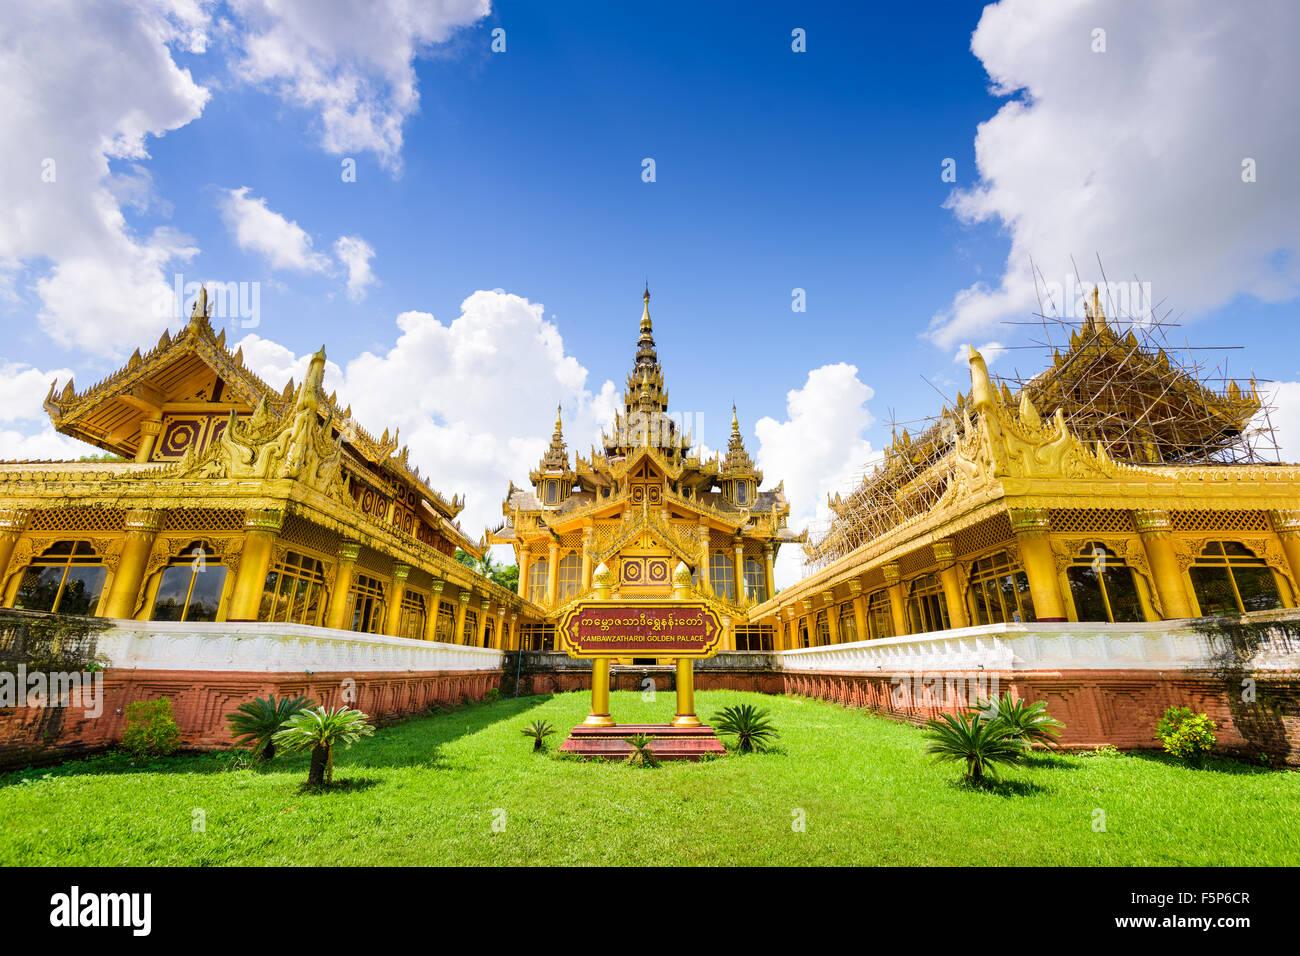 Bago, le Myanmar à Kambawzathardi Golden Palace. Photo Stock